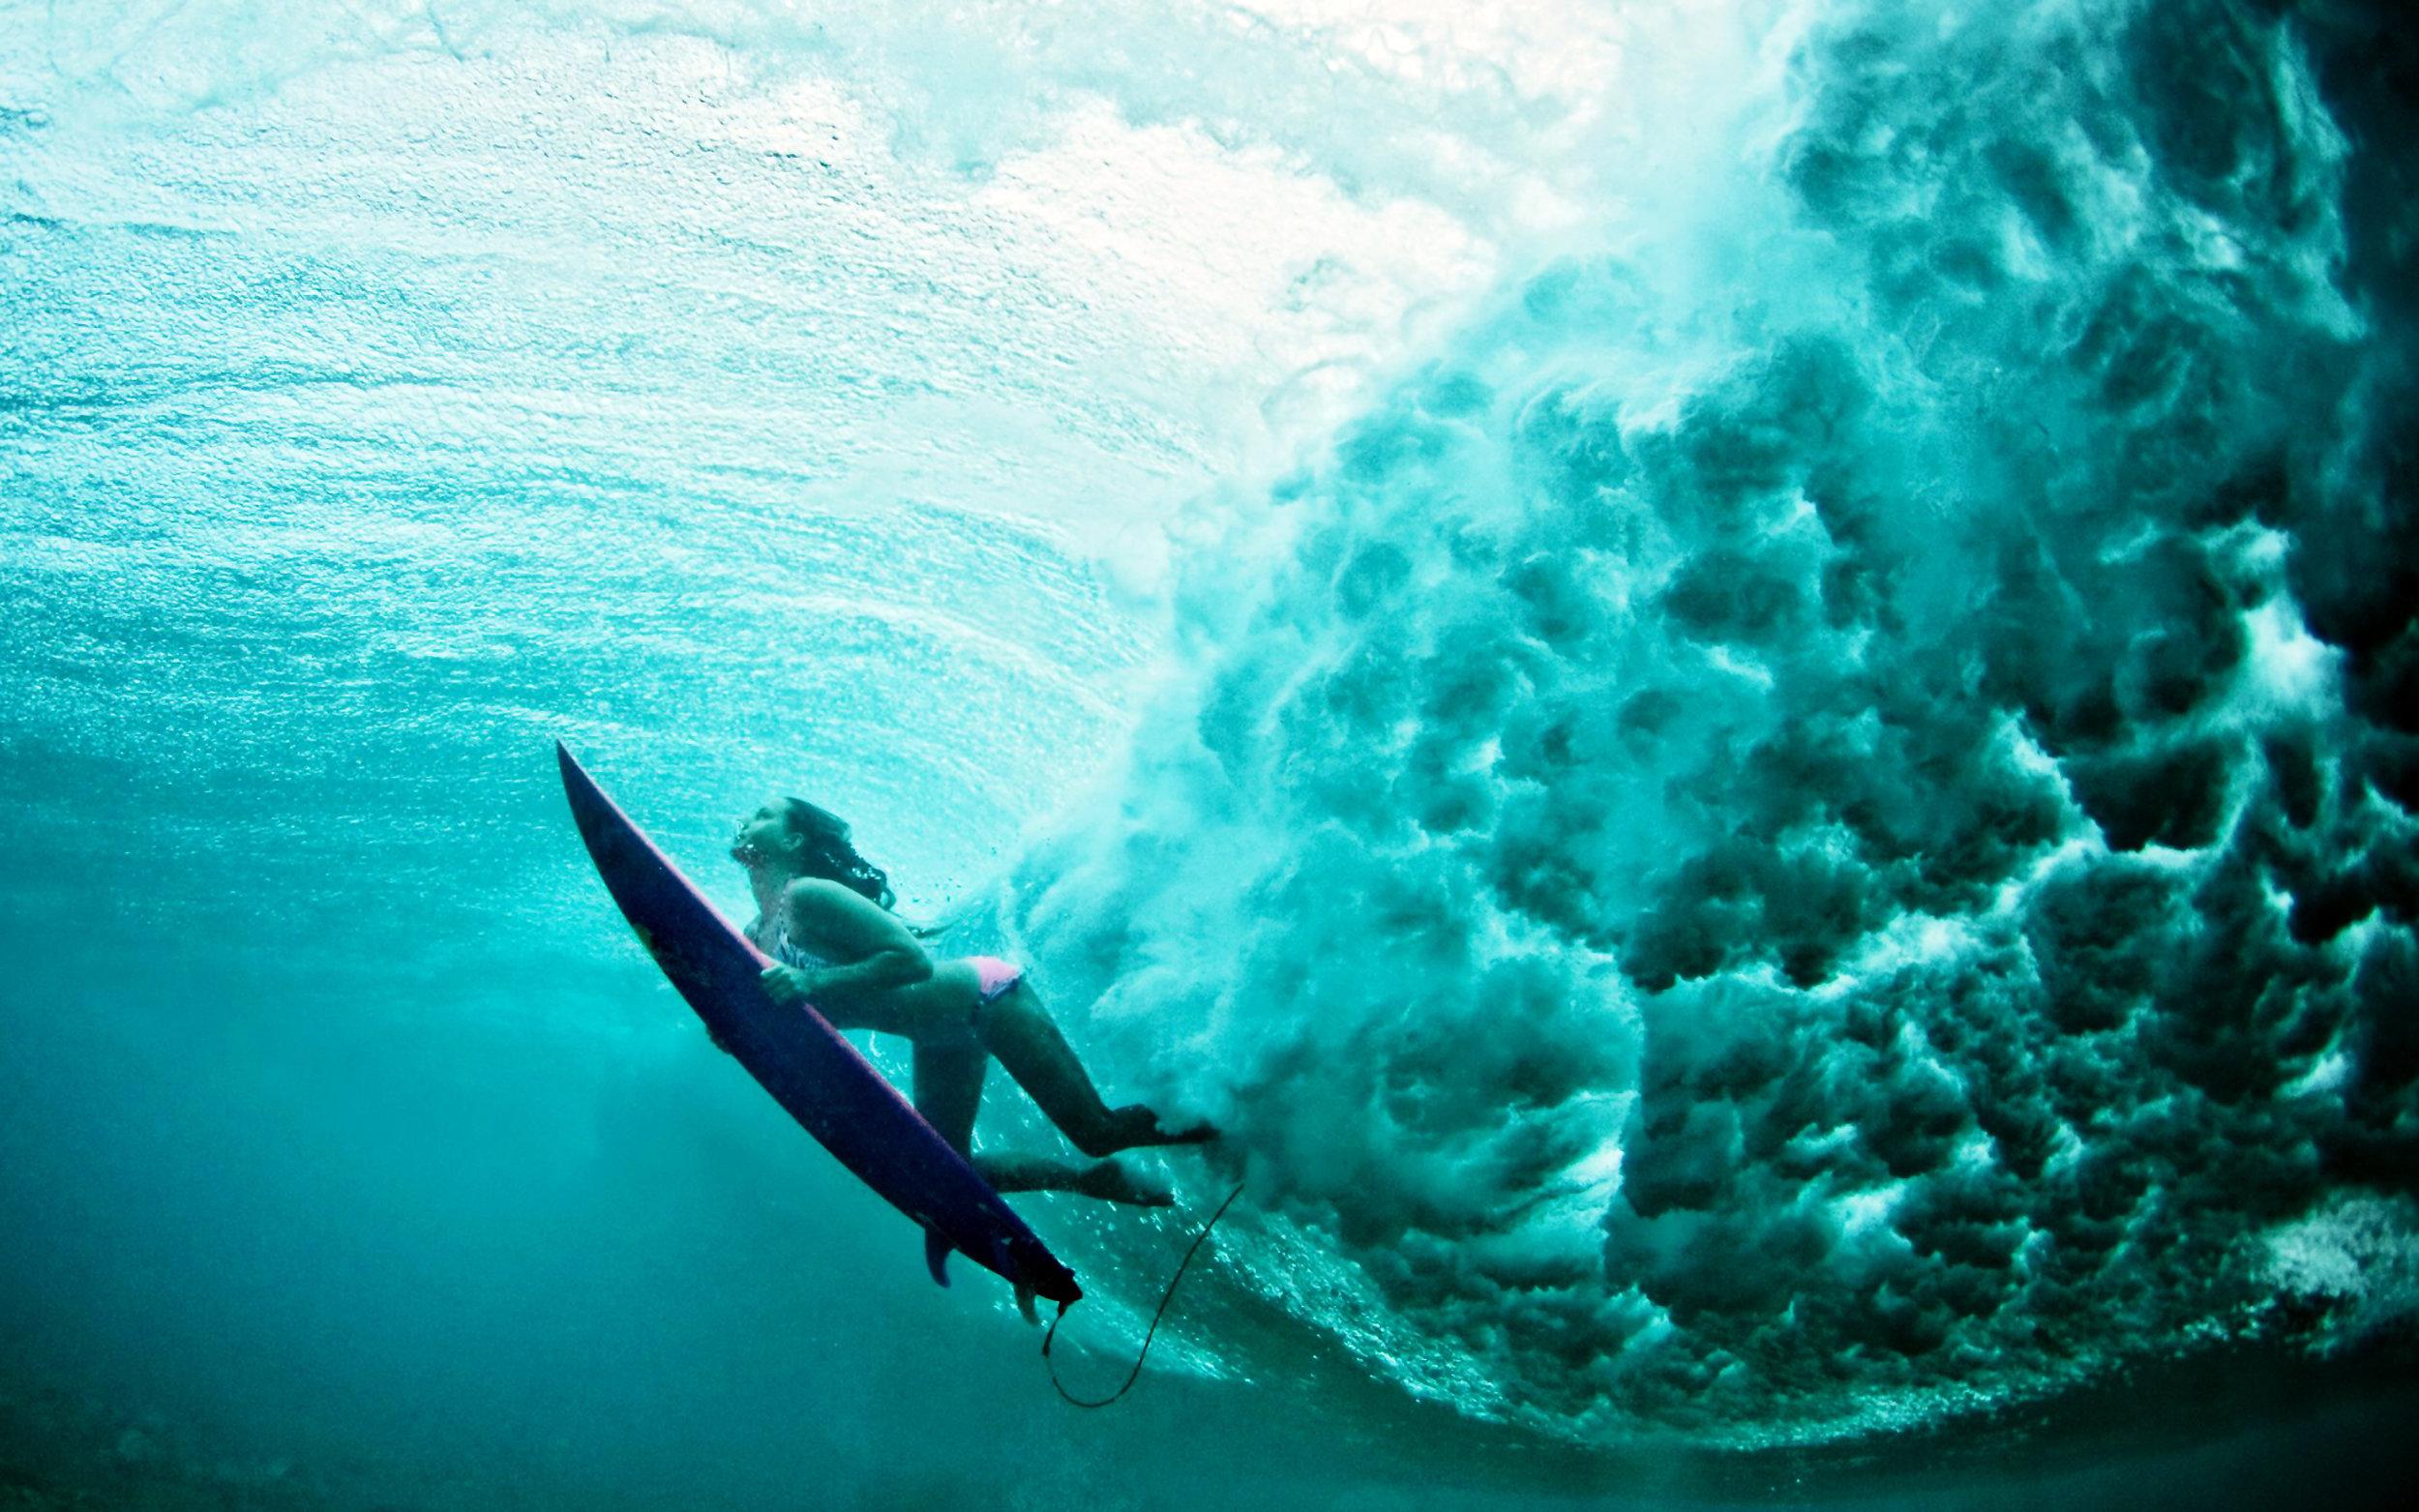 serf-pin-surf-girl-underwater-hd-placecom-on-pinterest-2304398.jpg